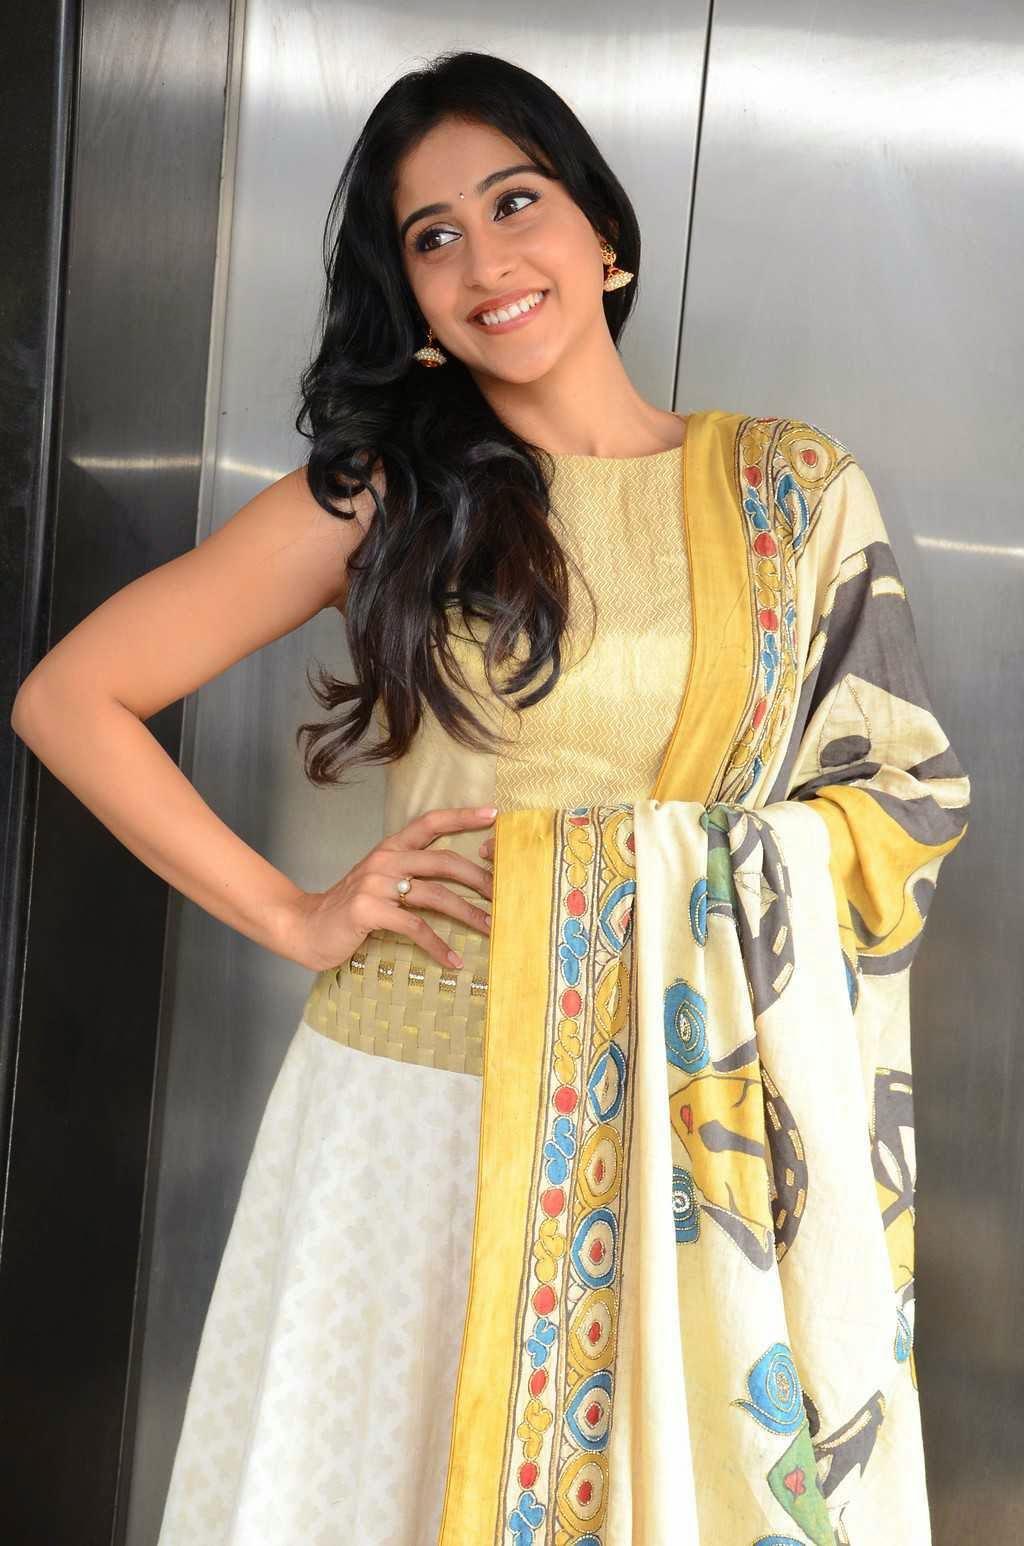 Actress Regina Cassandra Latest Cute Hot Exclusive Beautiful Yellow Dress Spicy Photos Gallery At Subramanyam For Sale Telugu Movie Press Meet (5)